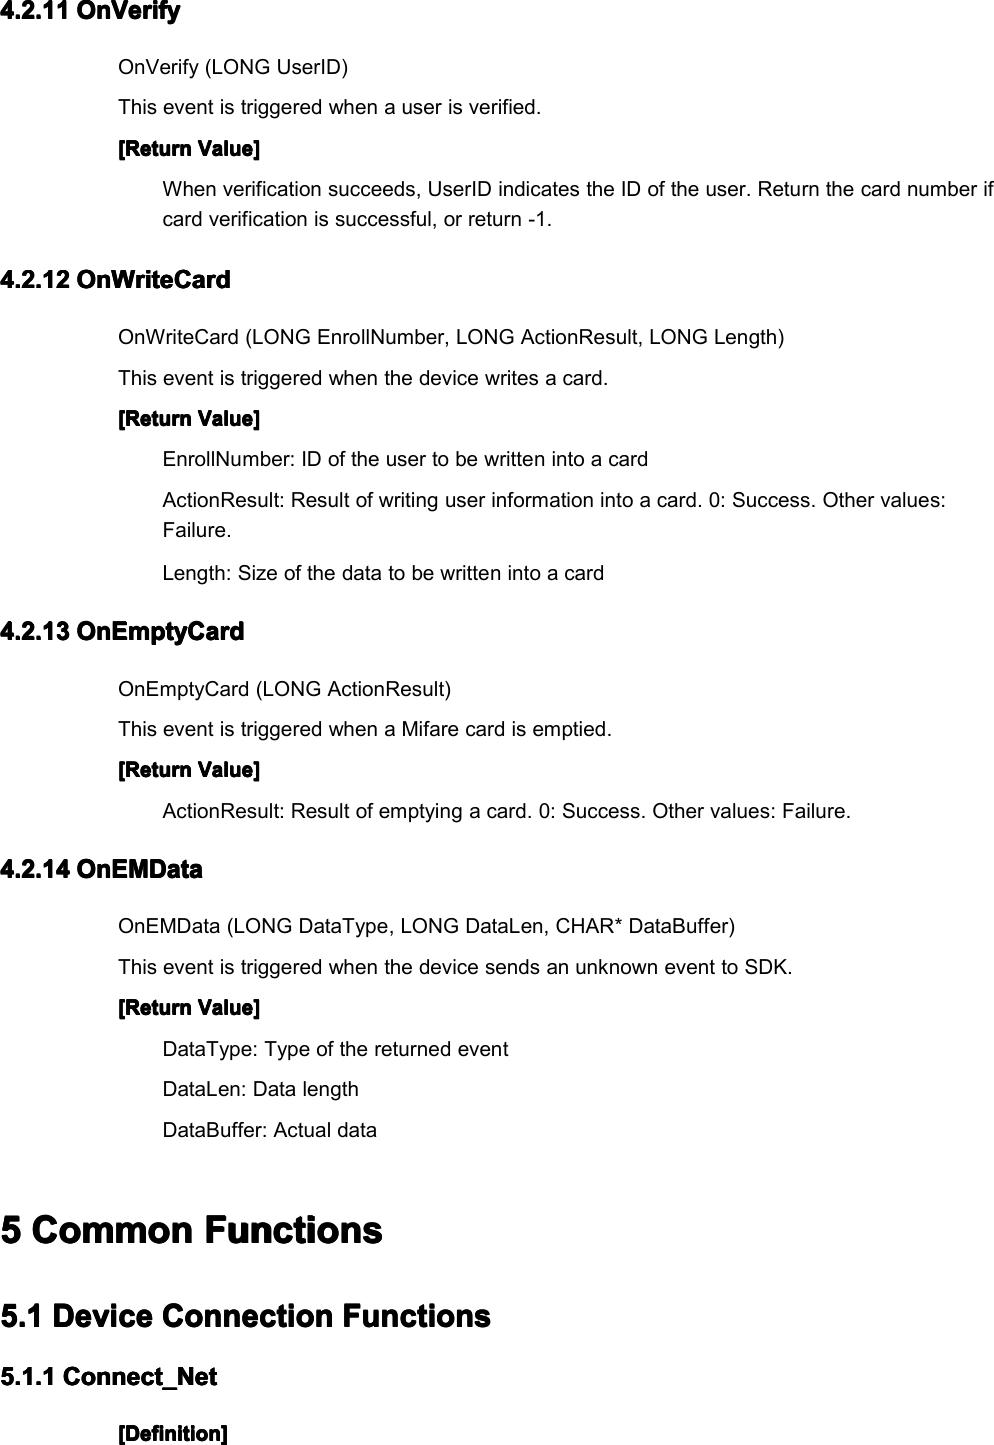 TFT Series SDK Manual